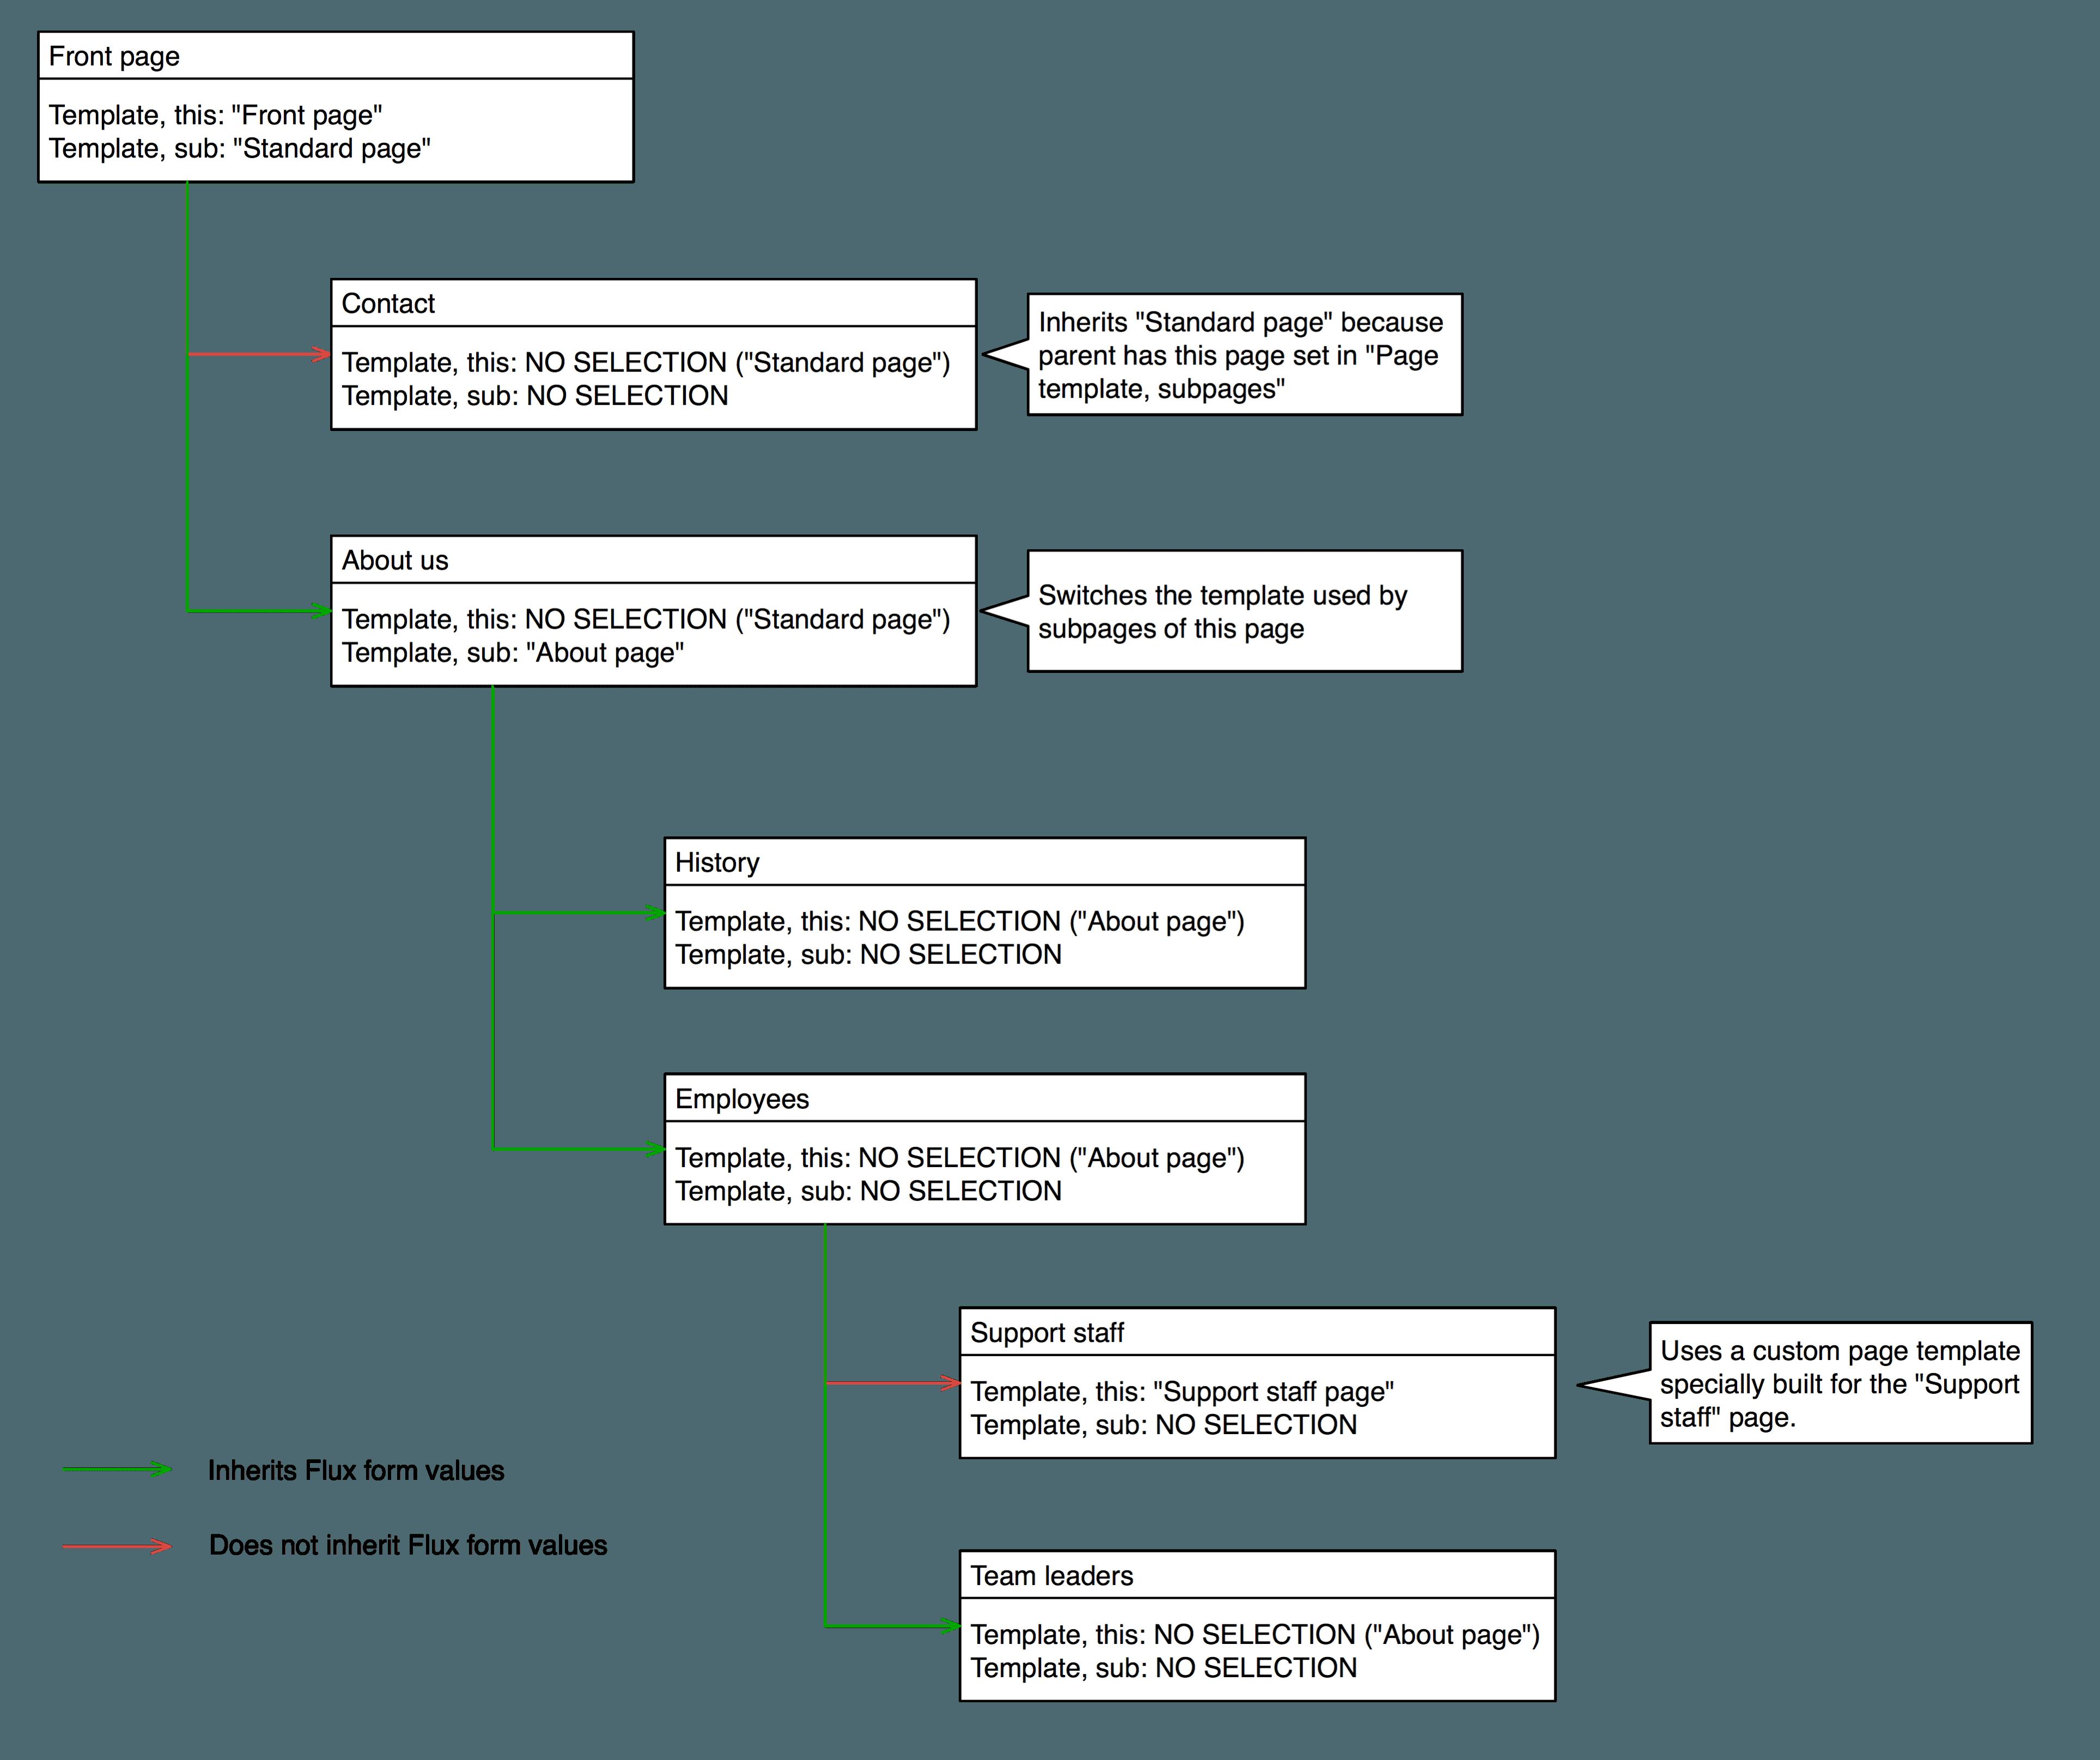 Fluid Powered TYPO3: Template inheritance